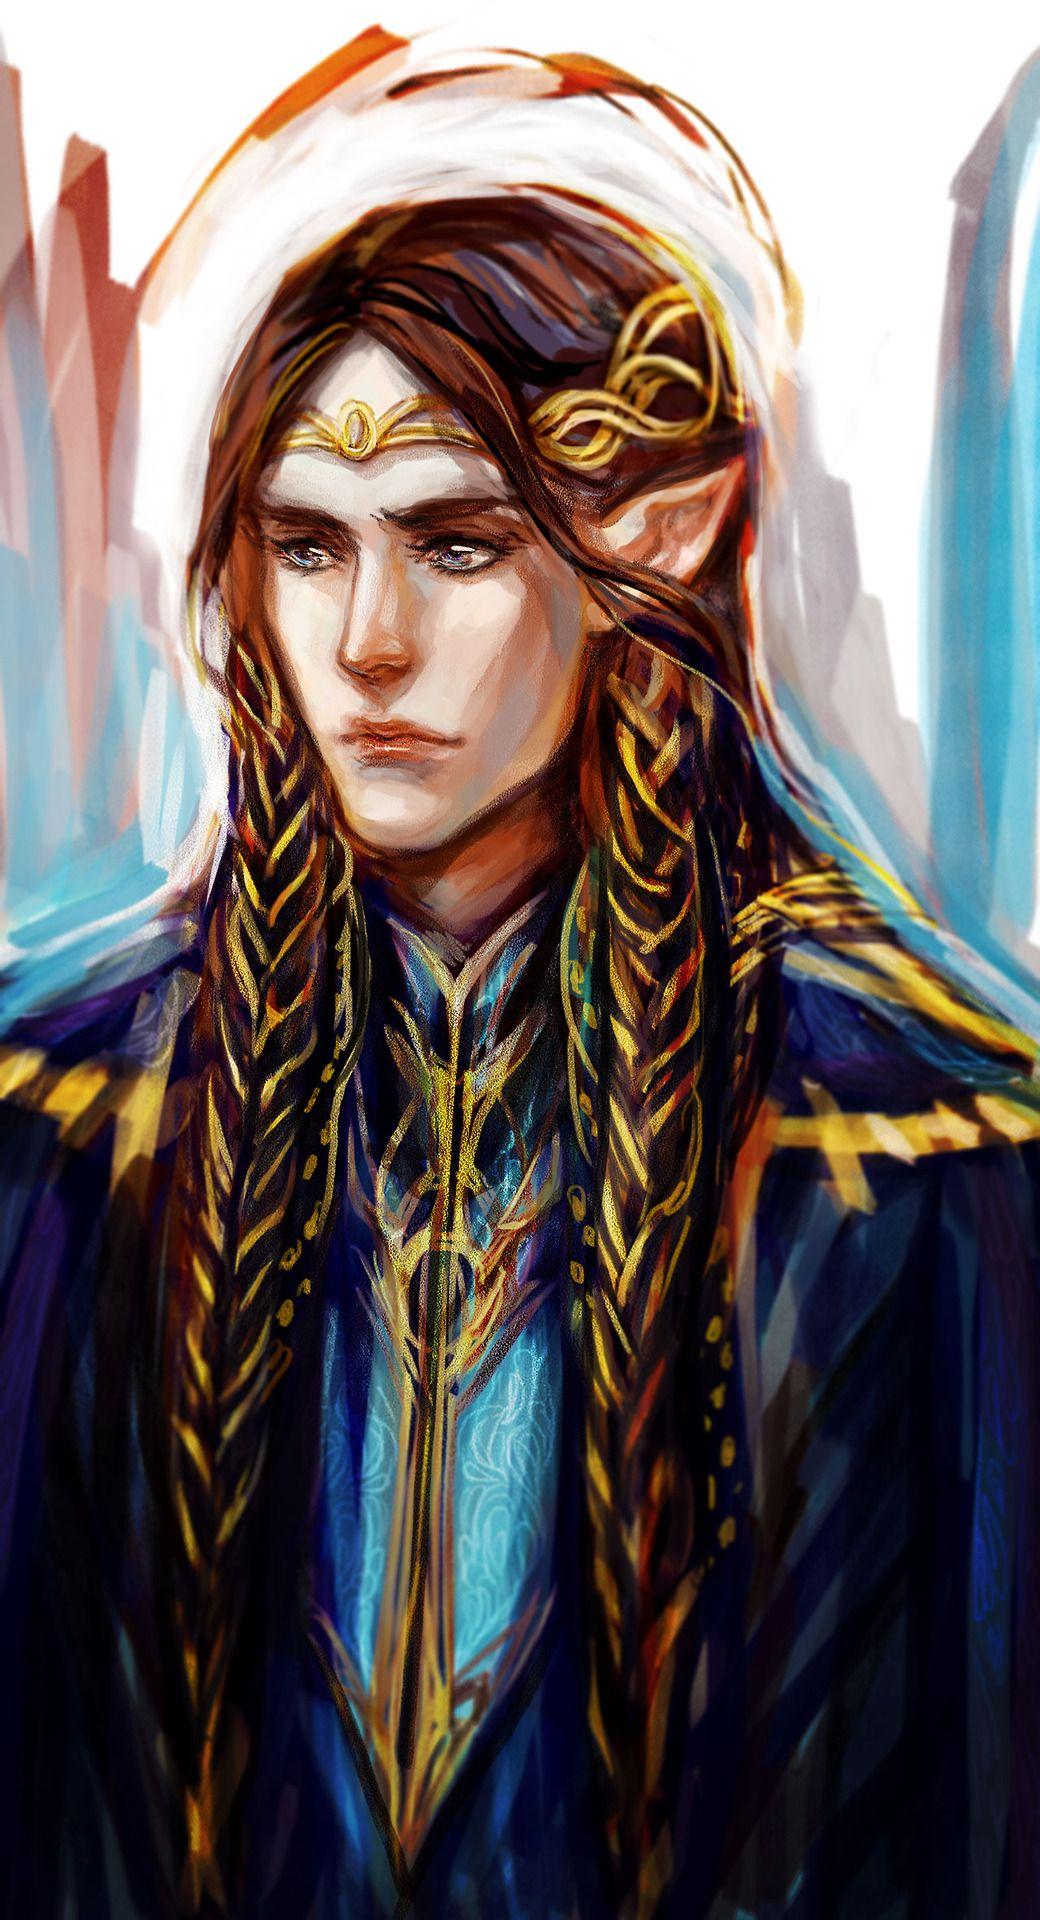 Fingon as High King for kingfingon by luaen #silmarillion #fanart